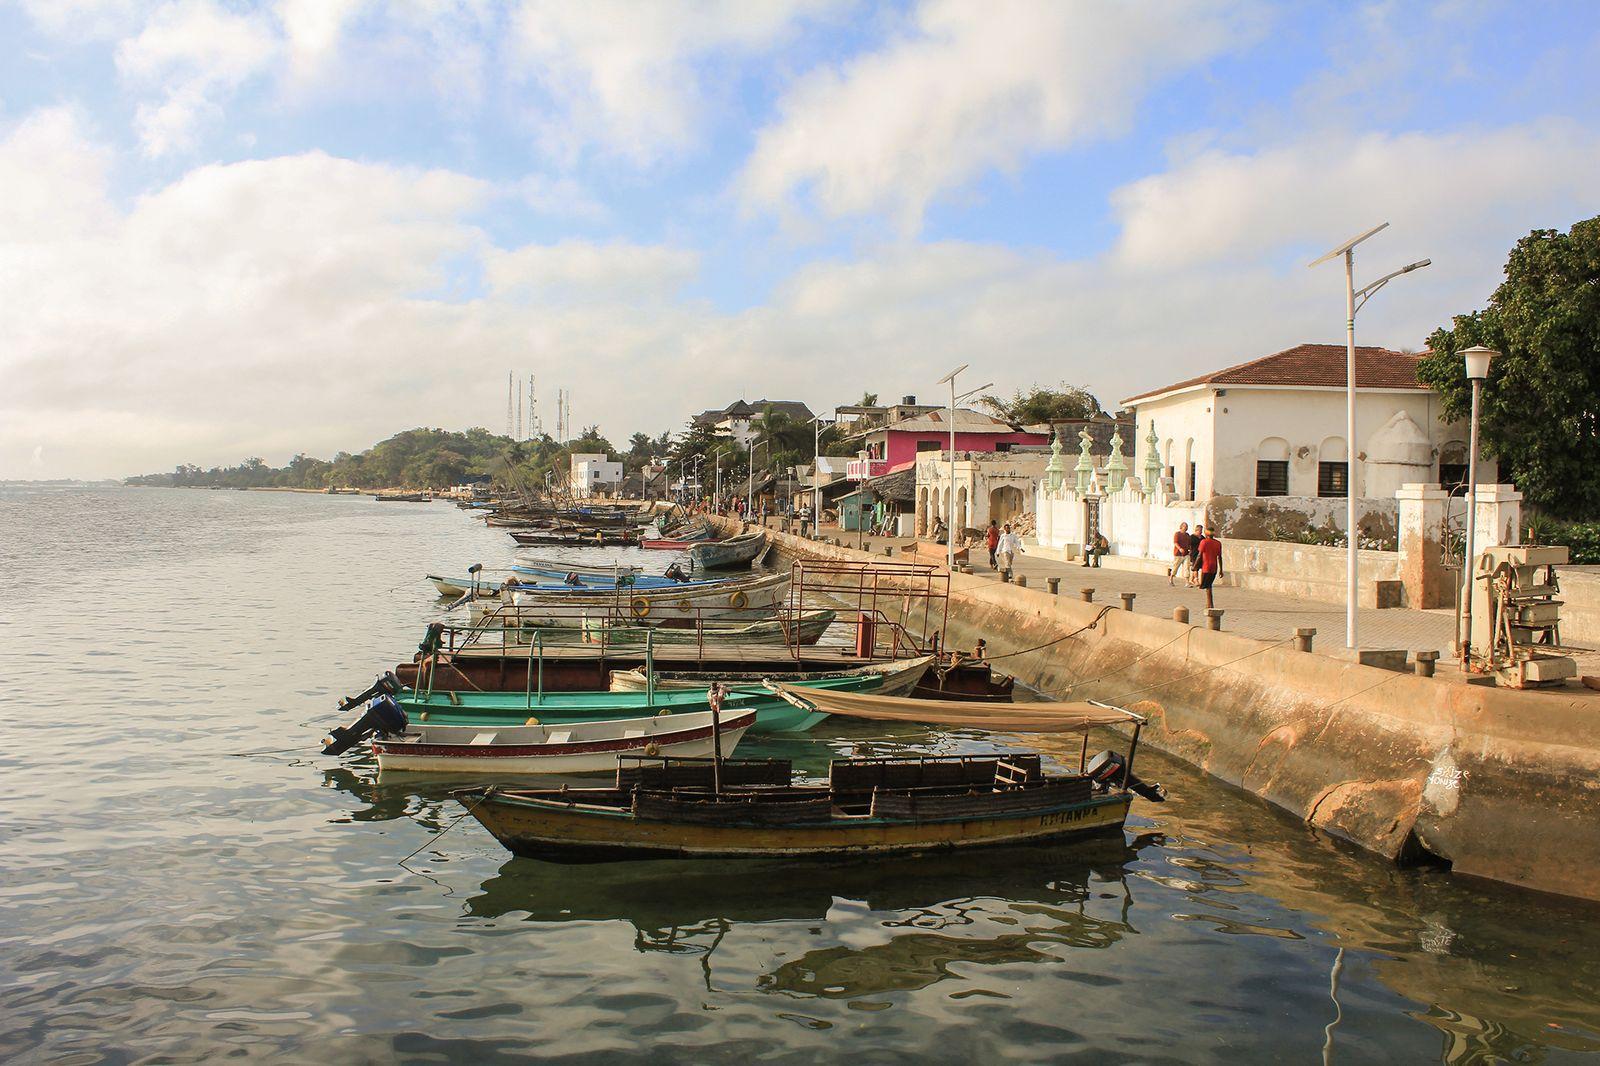 Top 6 Things To Do In Lamu Island, Kenya